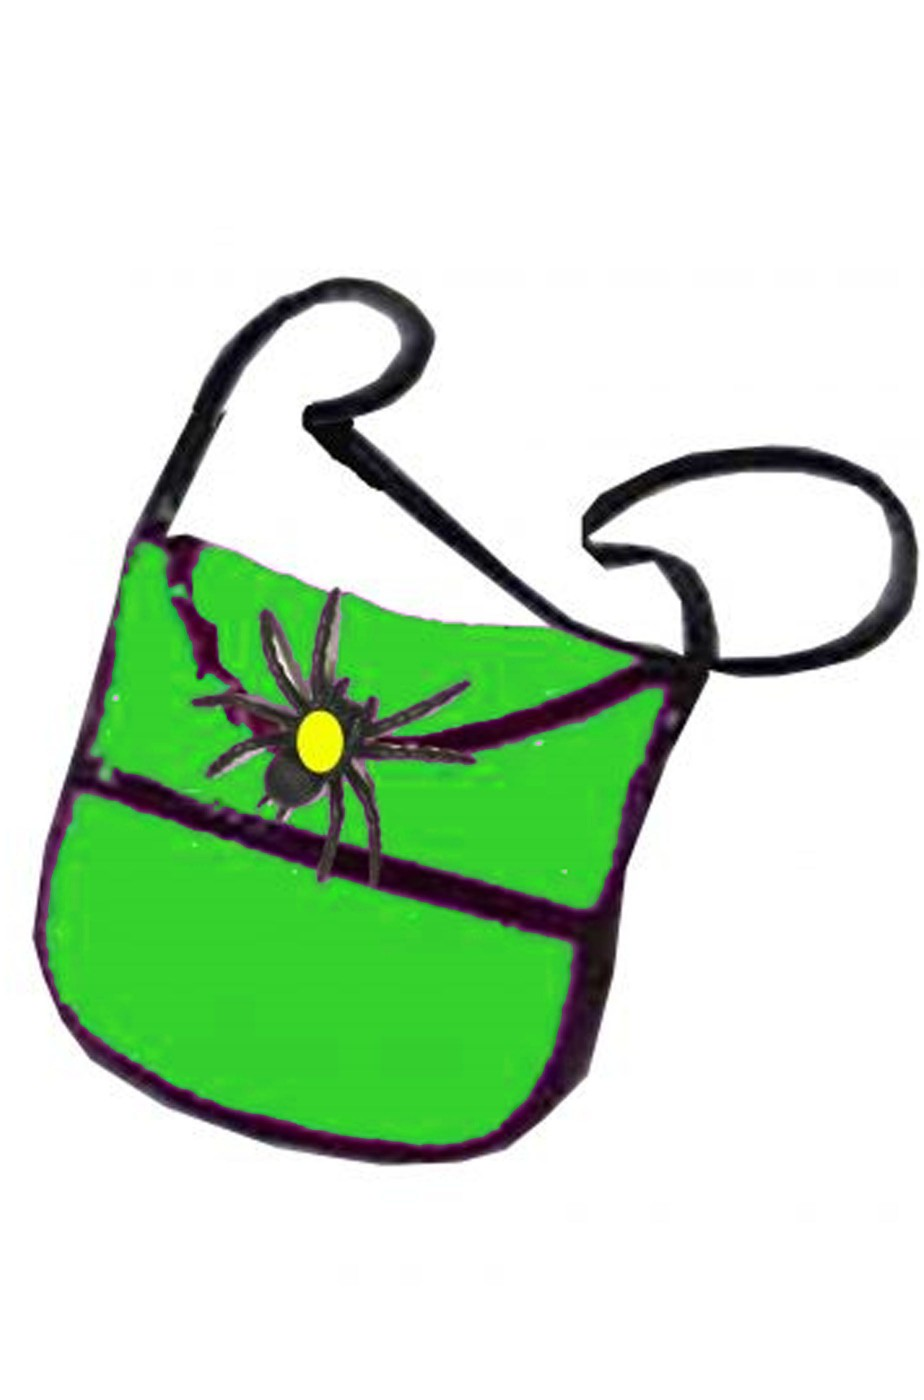 Borsa o borsetta da strega con ragno verde